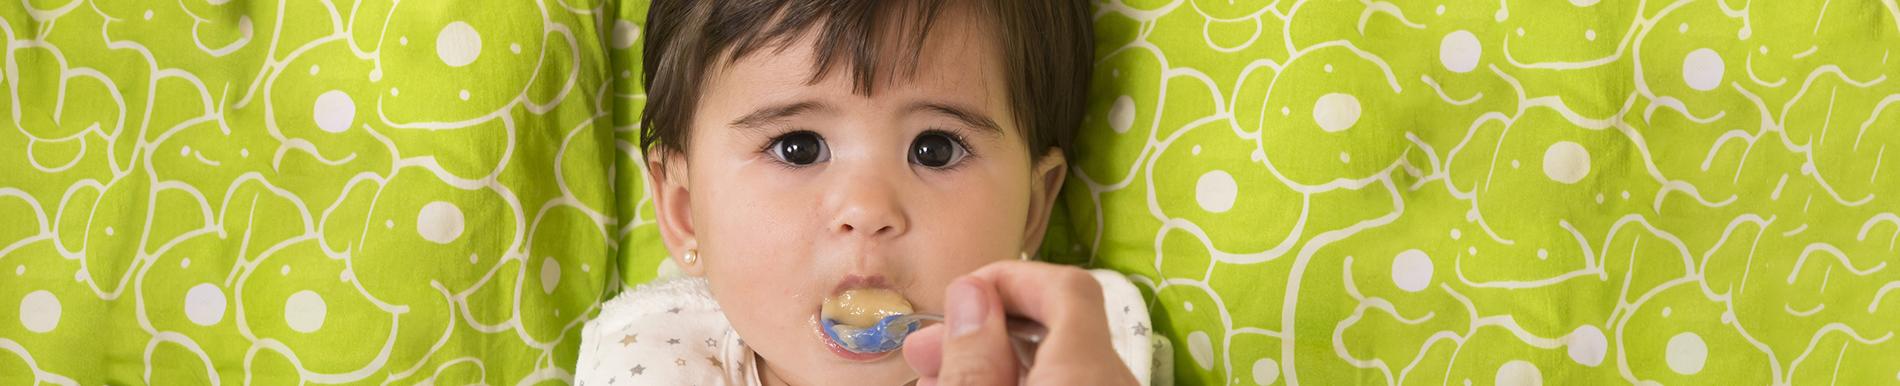 https://www.healthychildren.org/SiteCollectionImage-Homepage-Banners/HeavyMetalFoodBanner_es.jpg?csf=1&e=x6jOMf